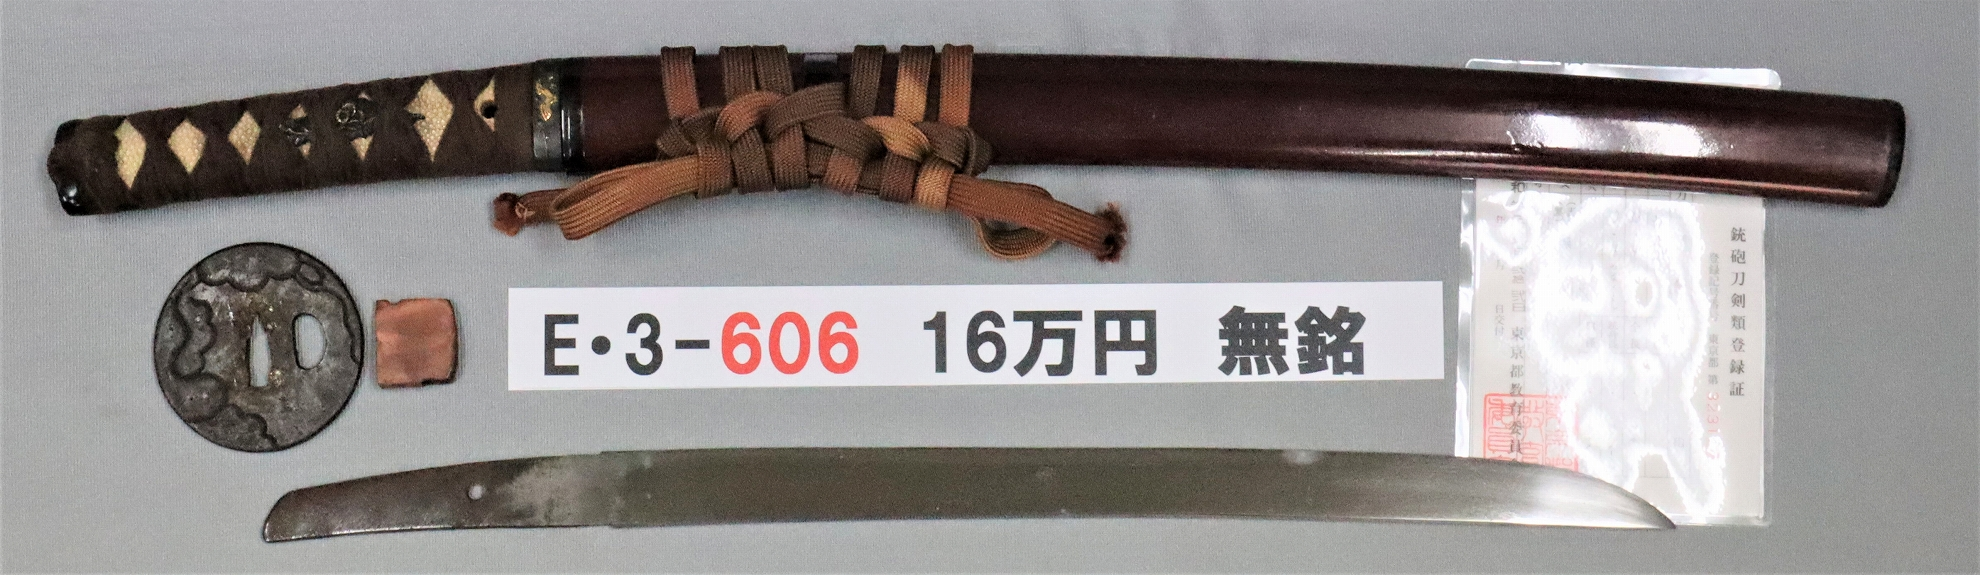 E3606